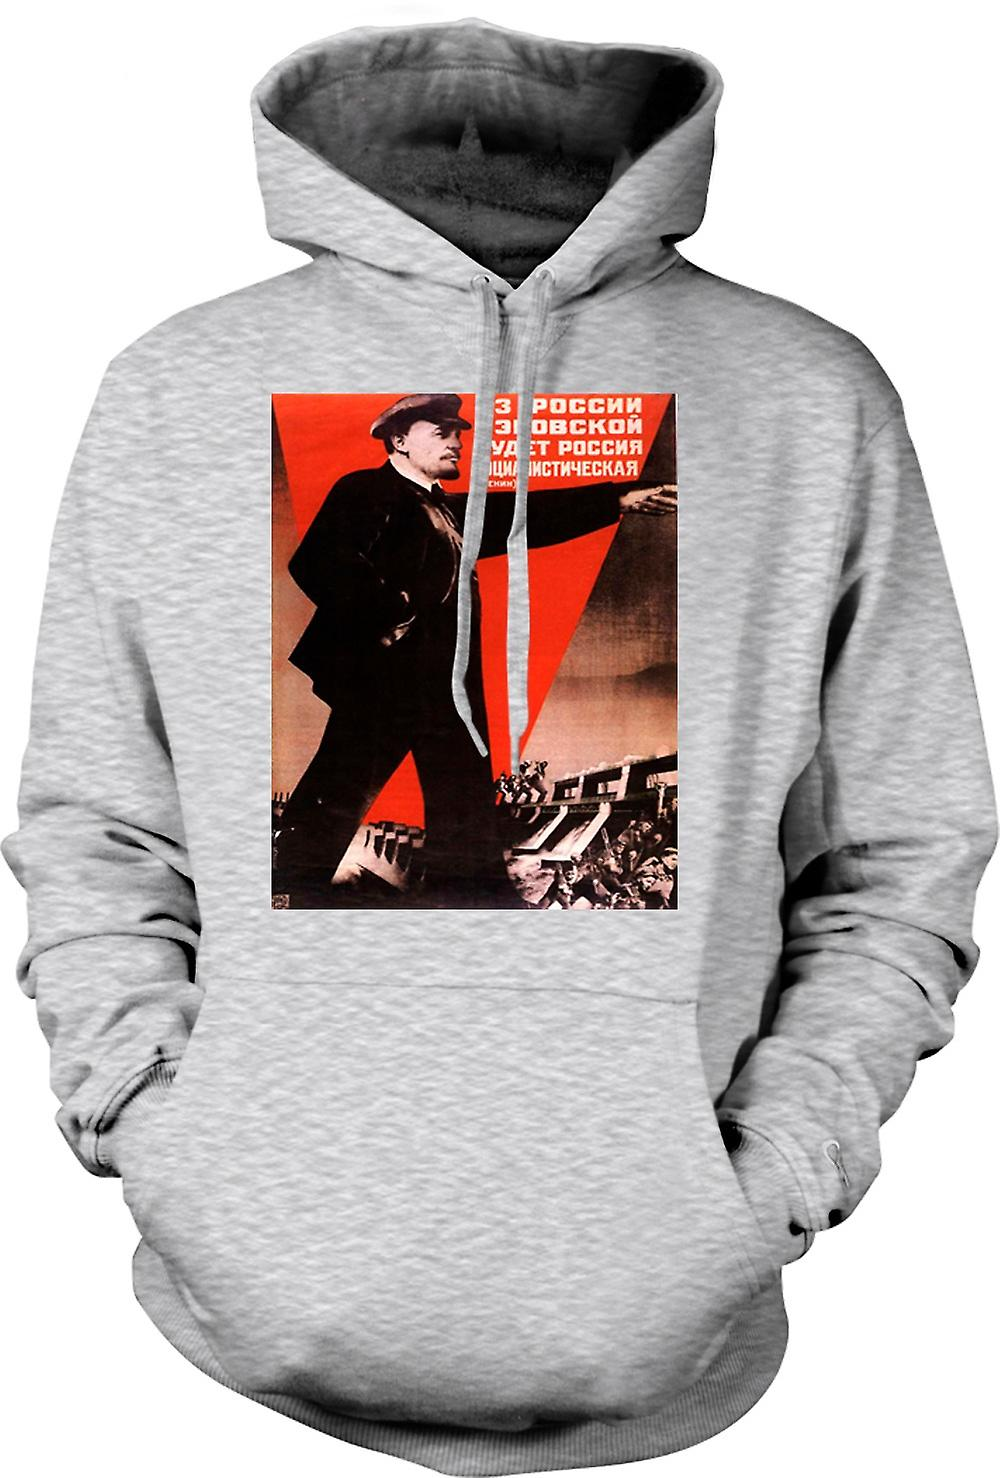 Mens Hoodie - affiche de propagande russe Lénine